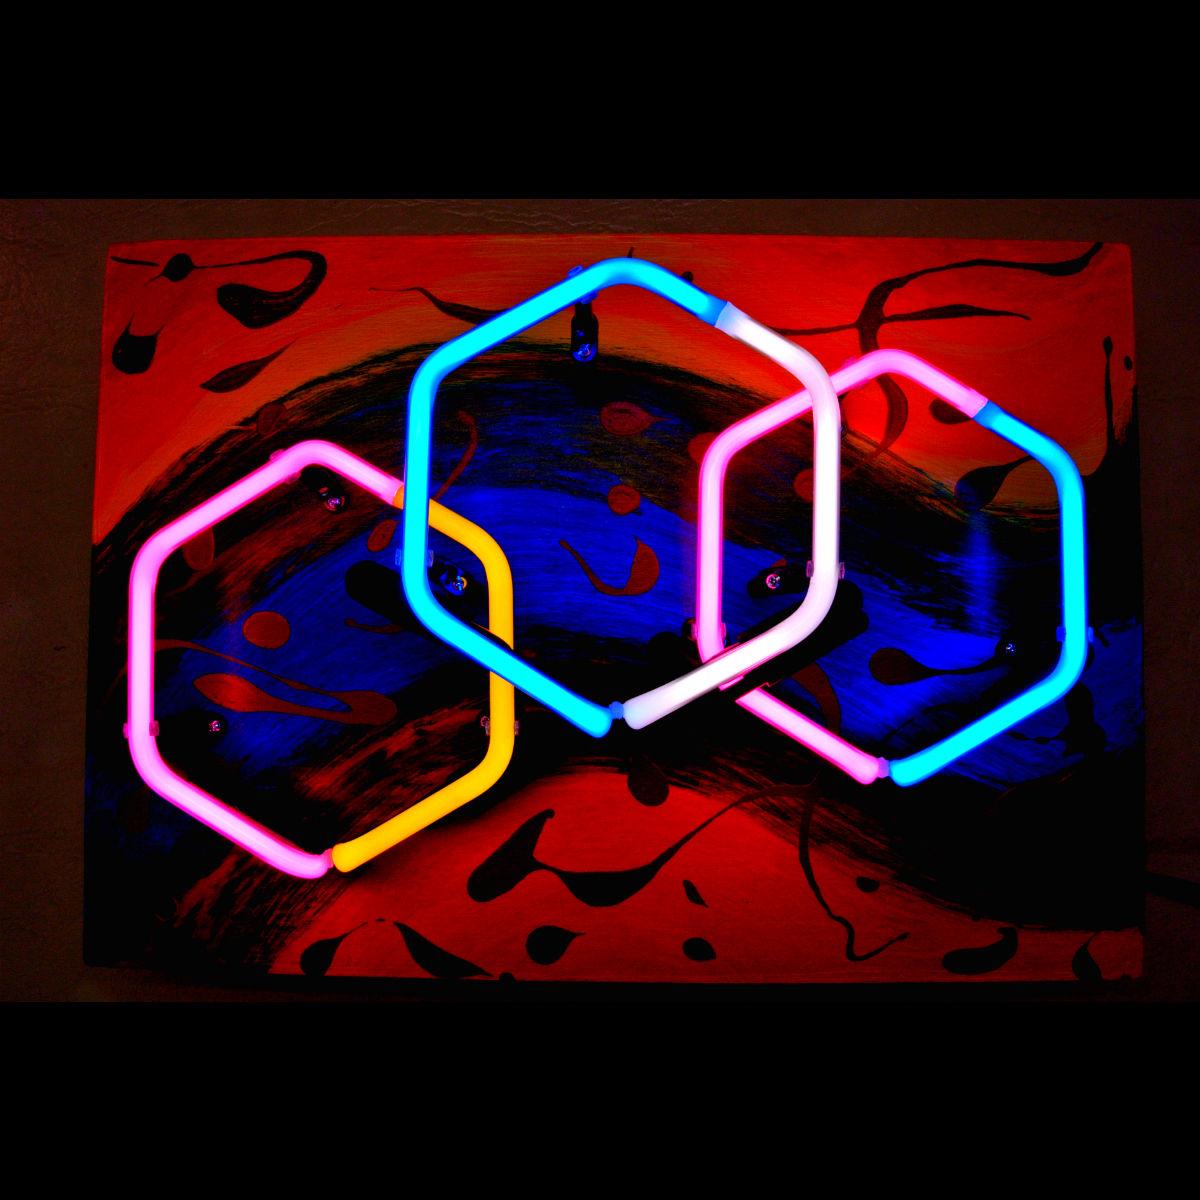 Parisian Neon Light Sculpture - Designer Neon Art by John Barton - BartonNeonMagic.com